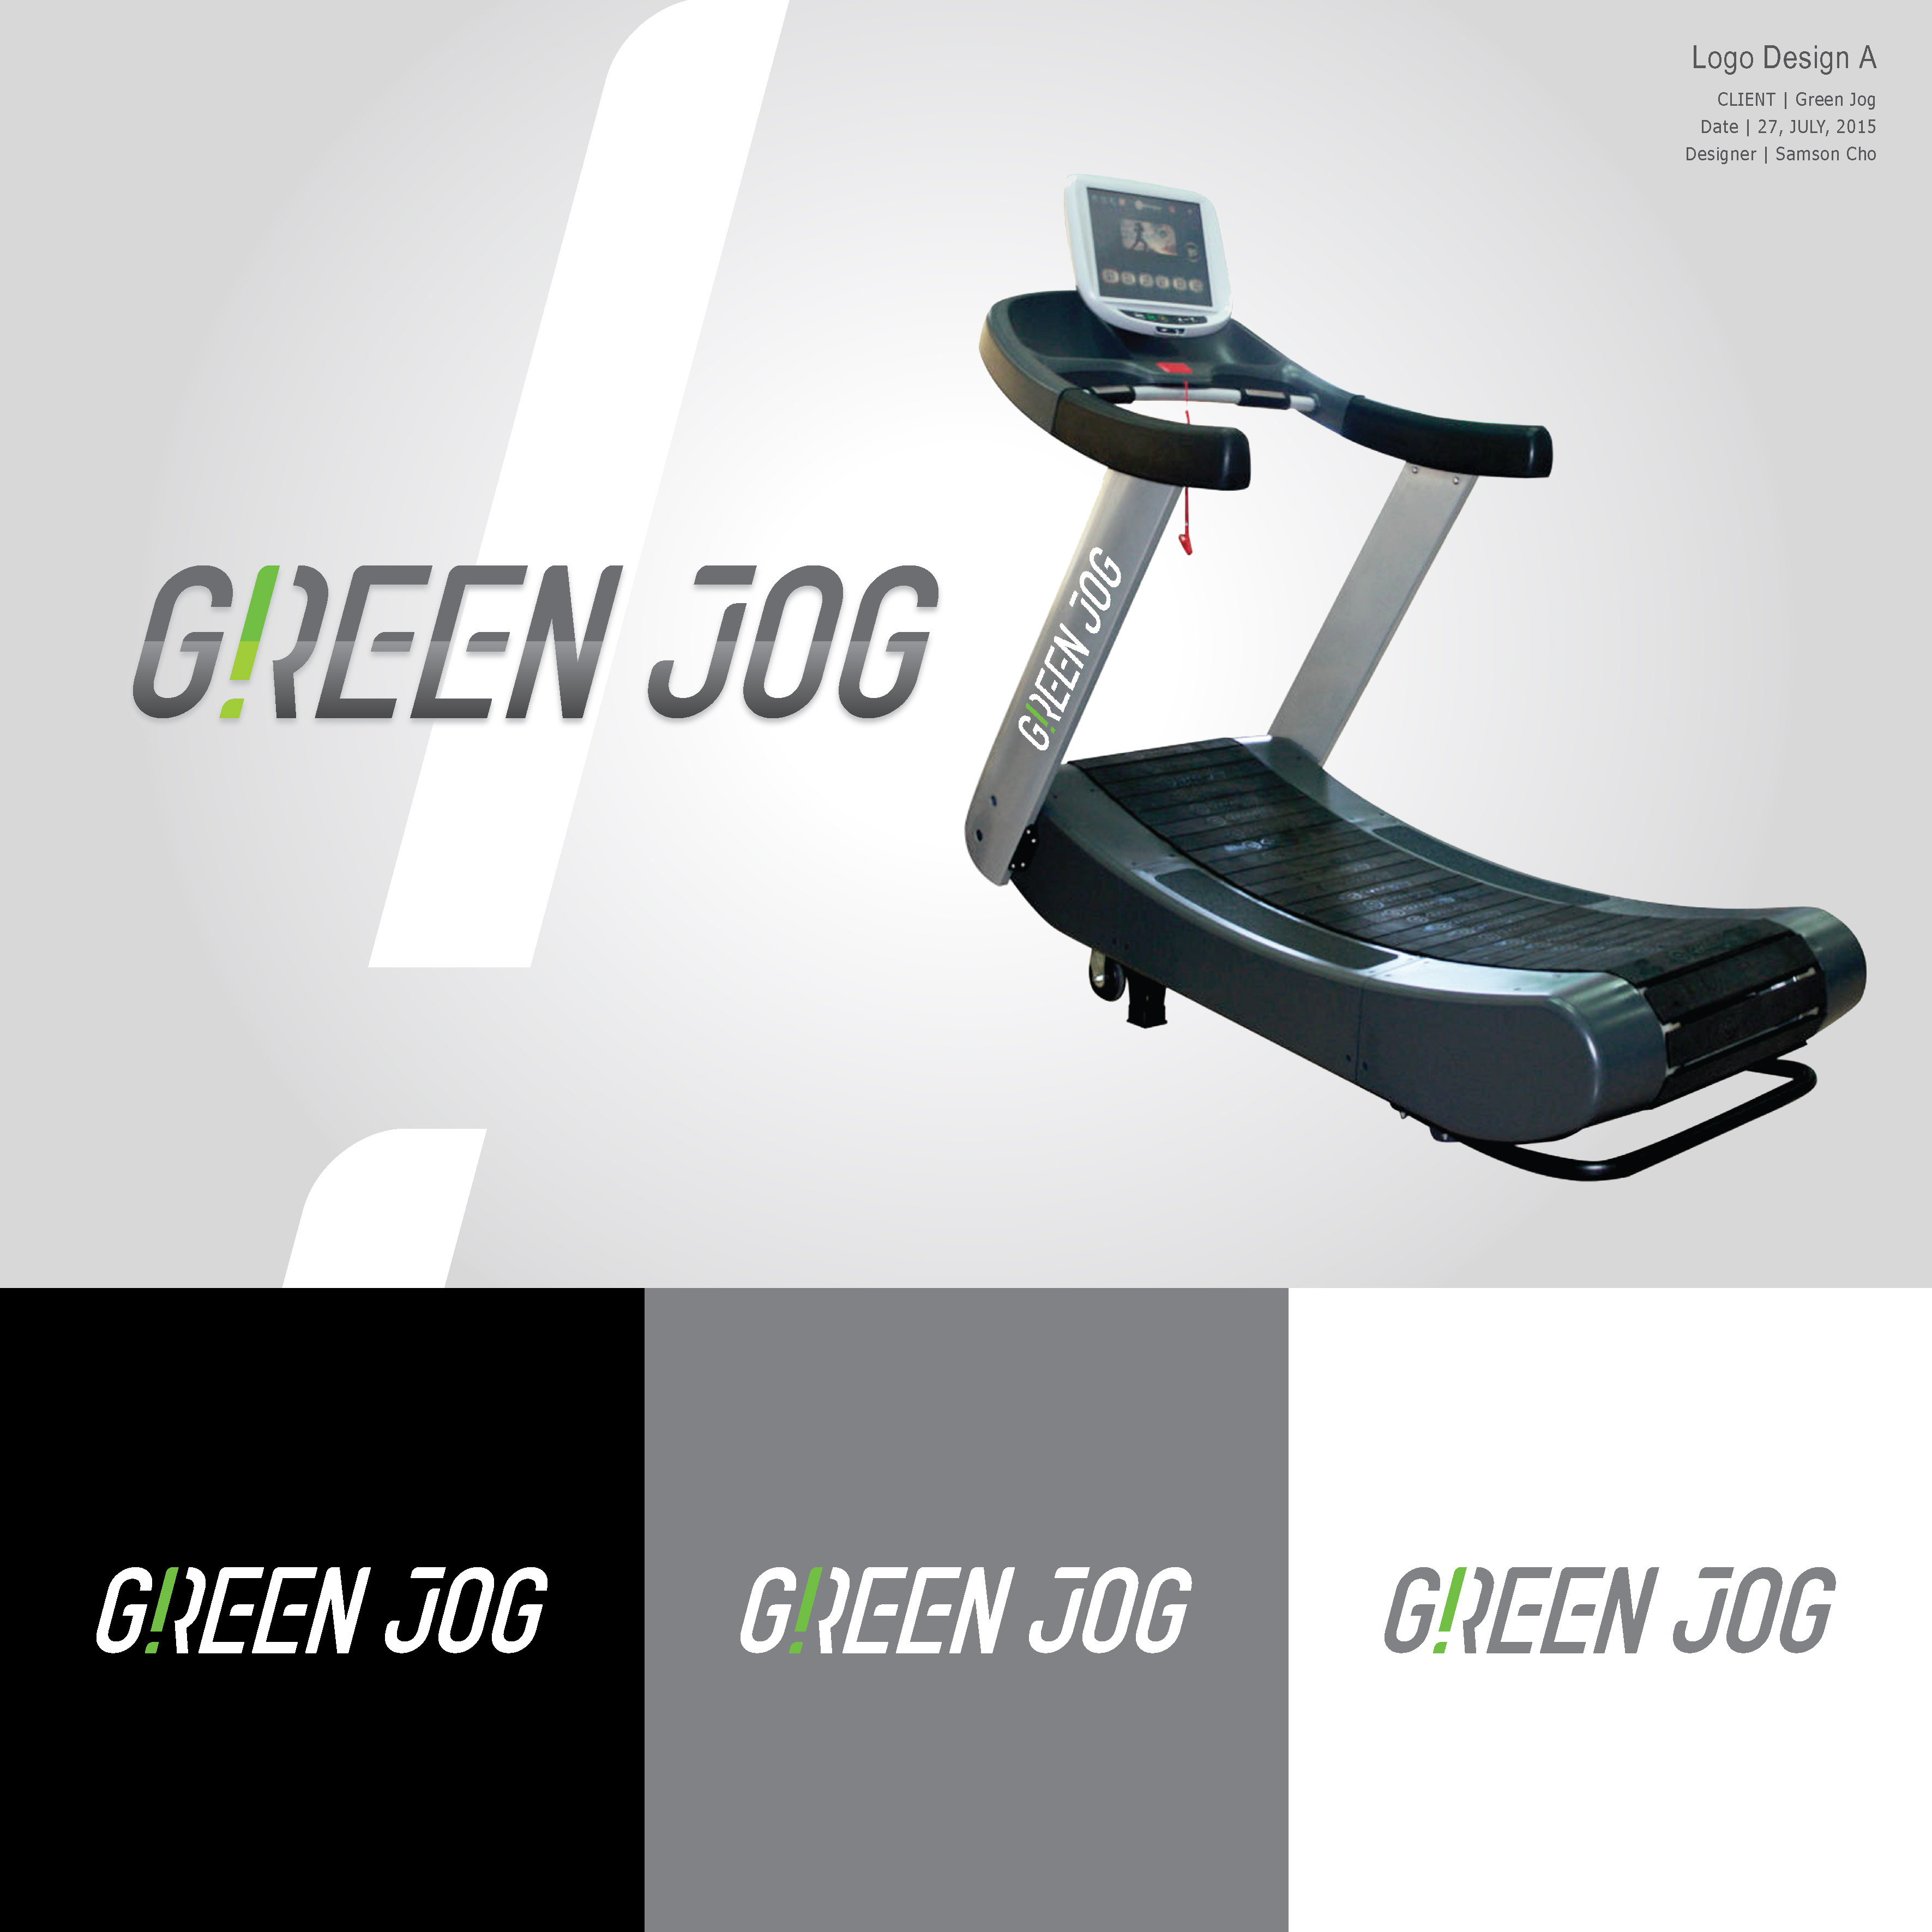 Greenjog Logo Design